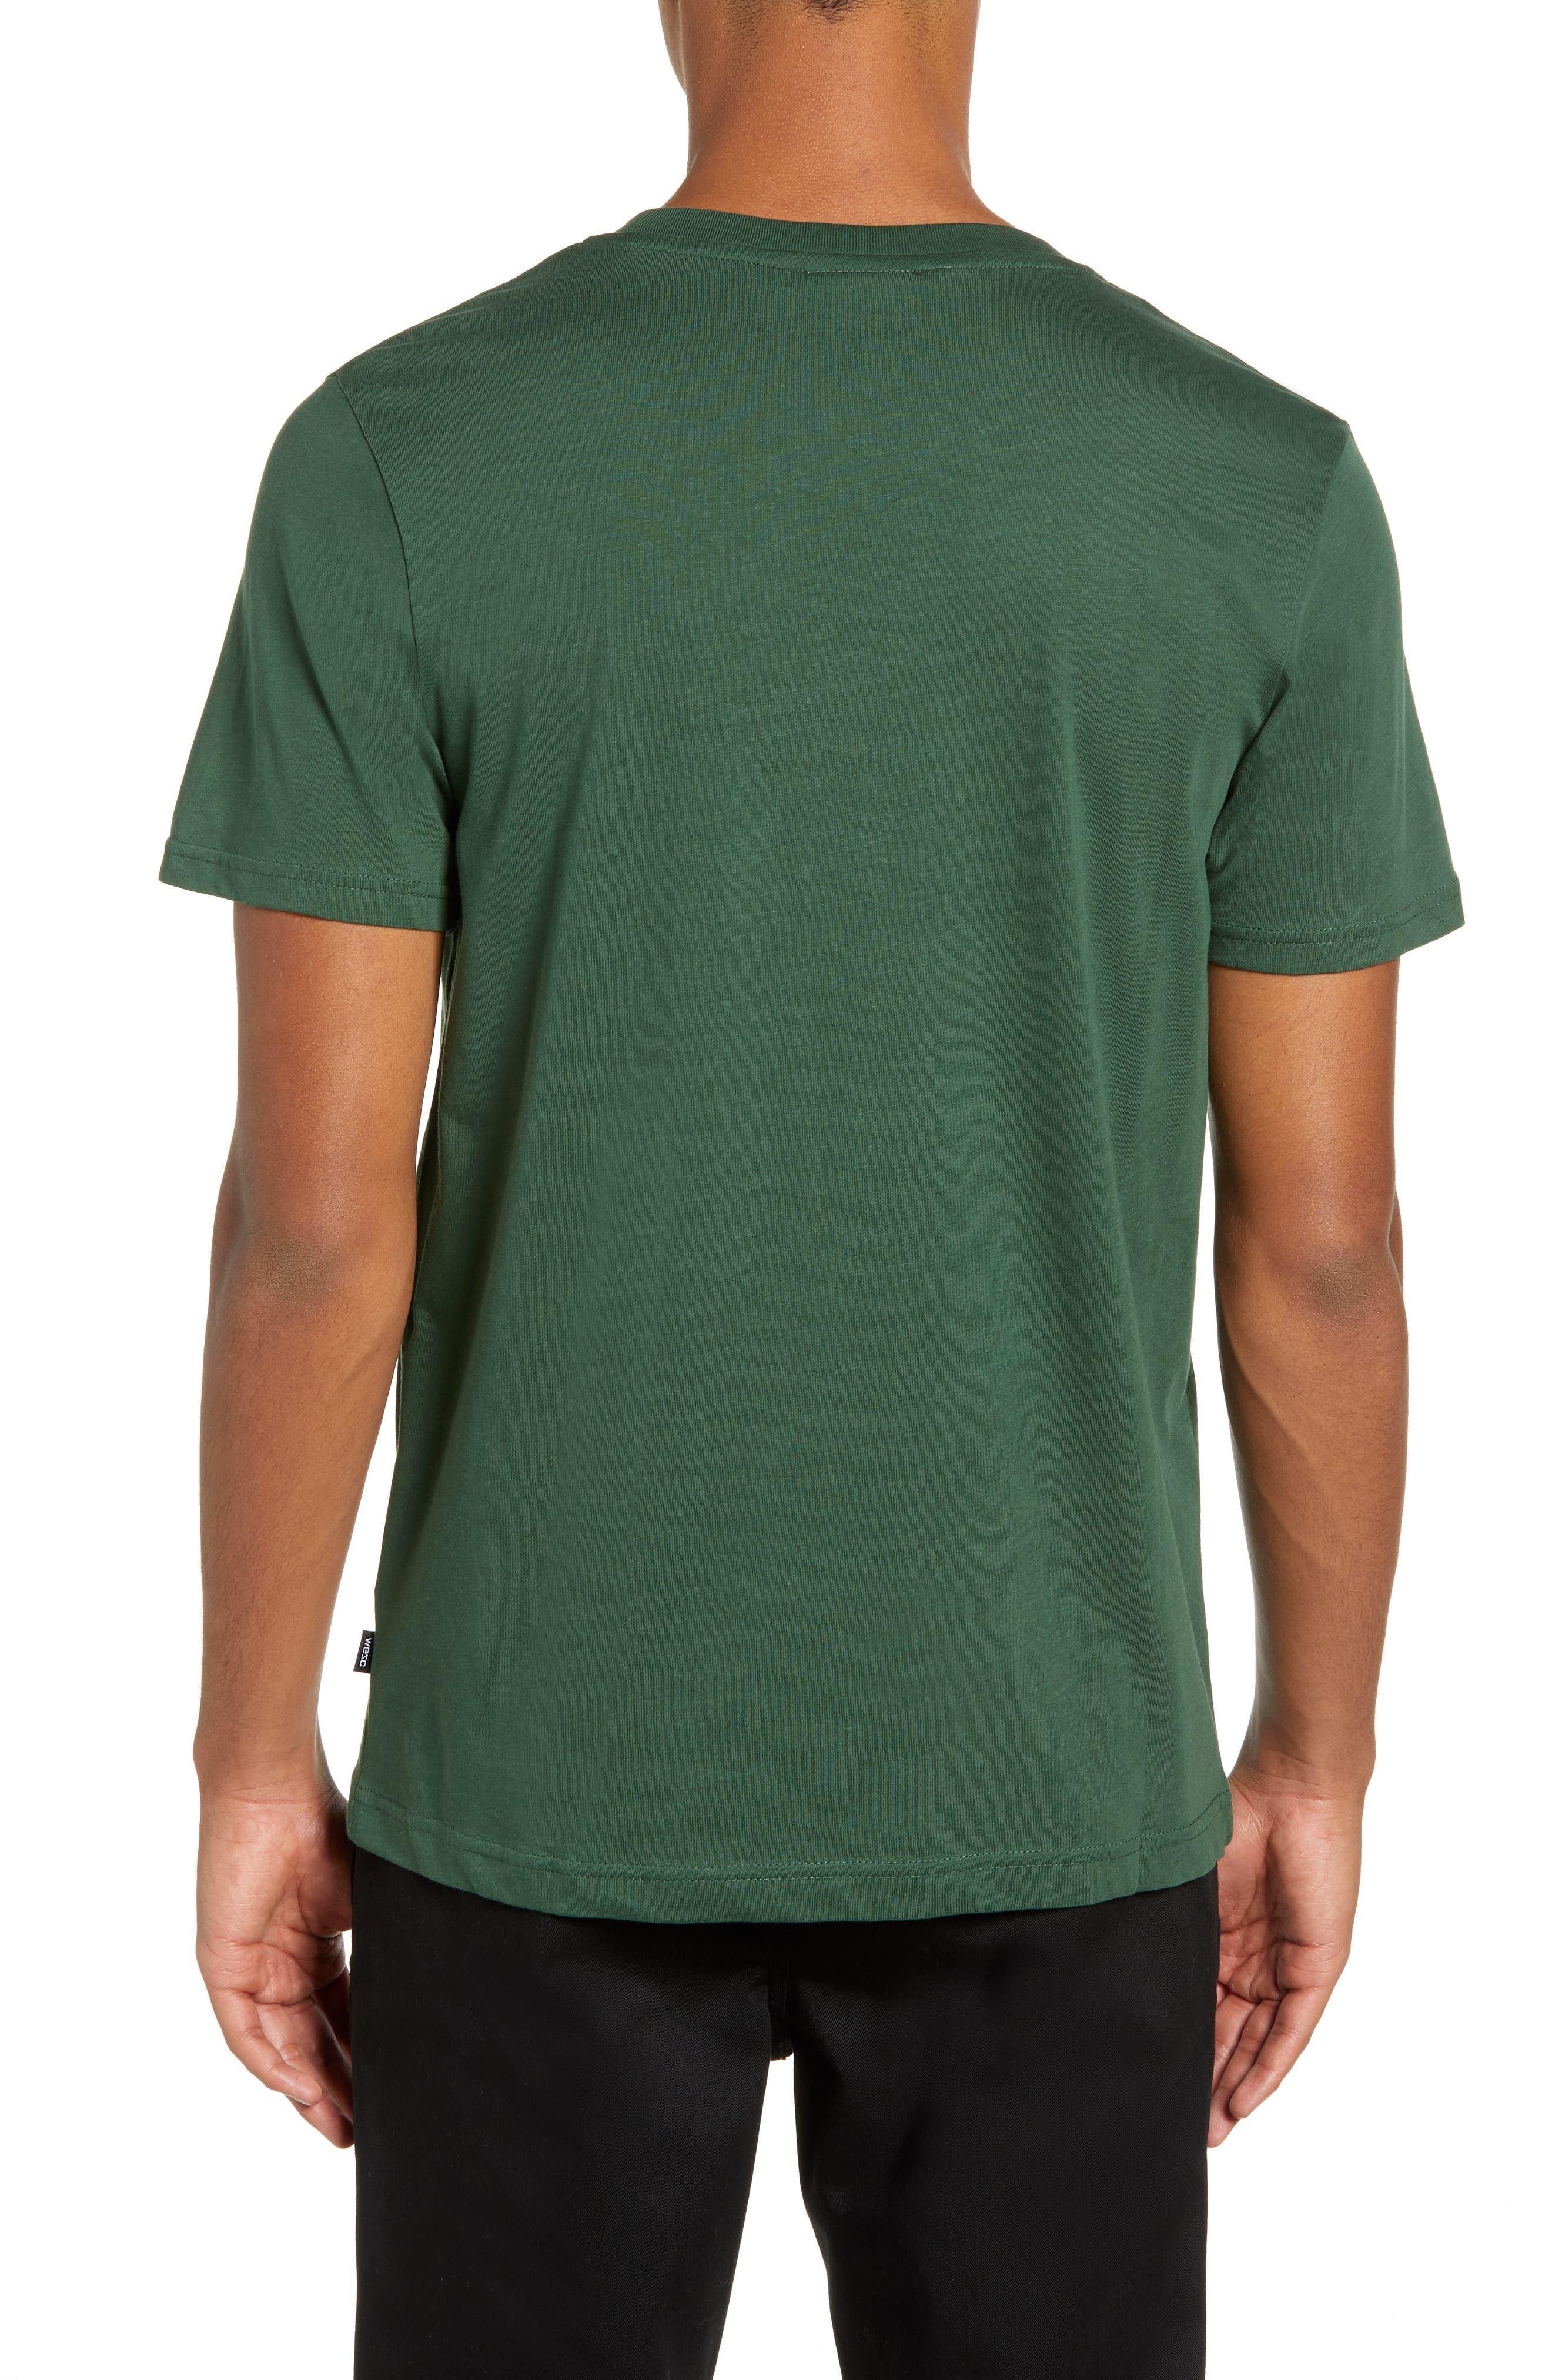 Max More Love Graphic T-Shirt,                             Alternate thumbnail 2, color,                             357